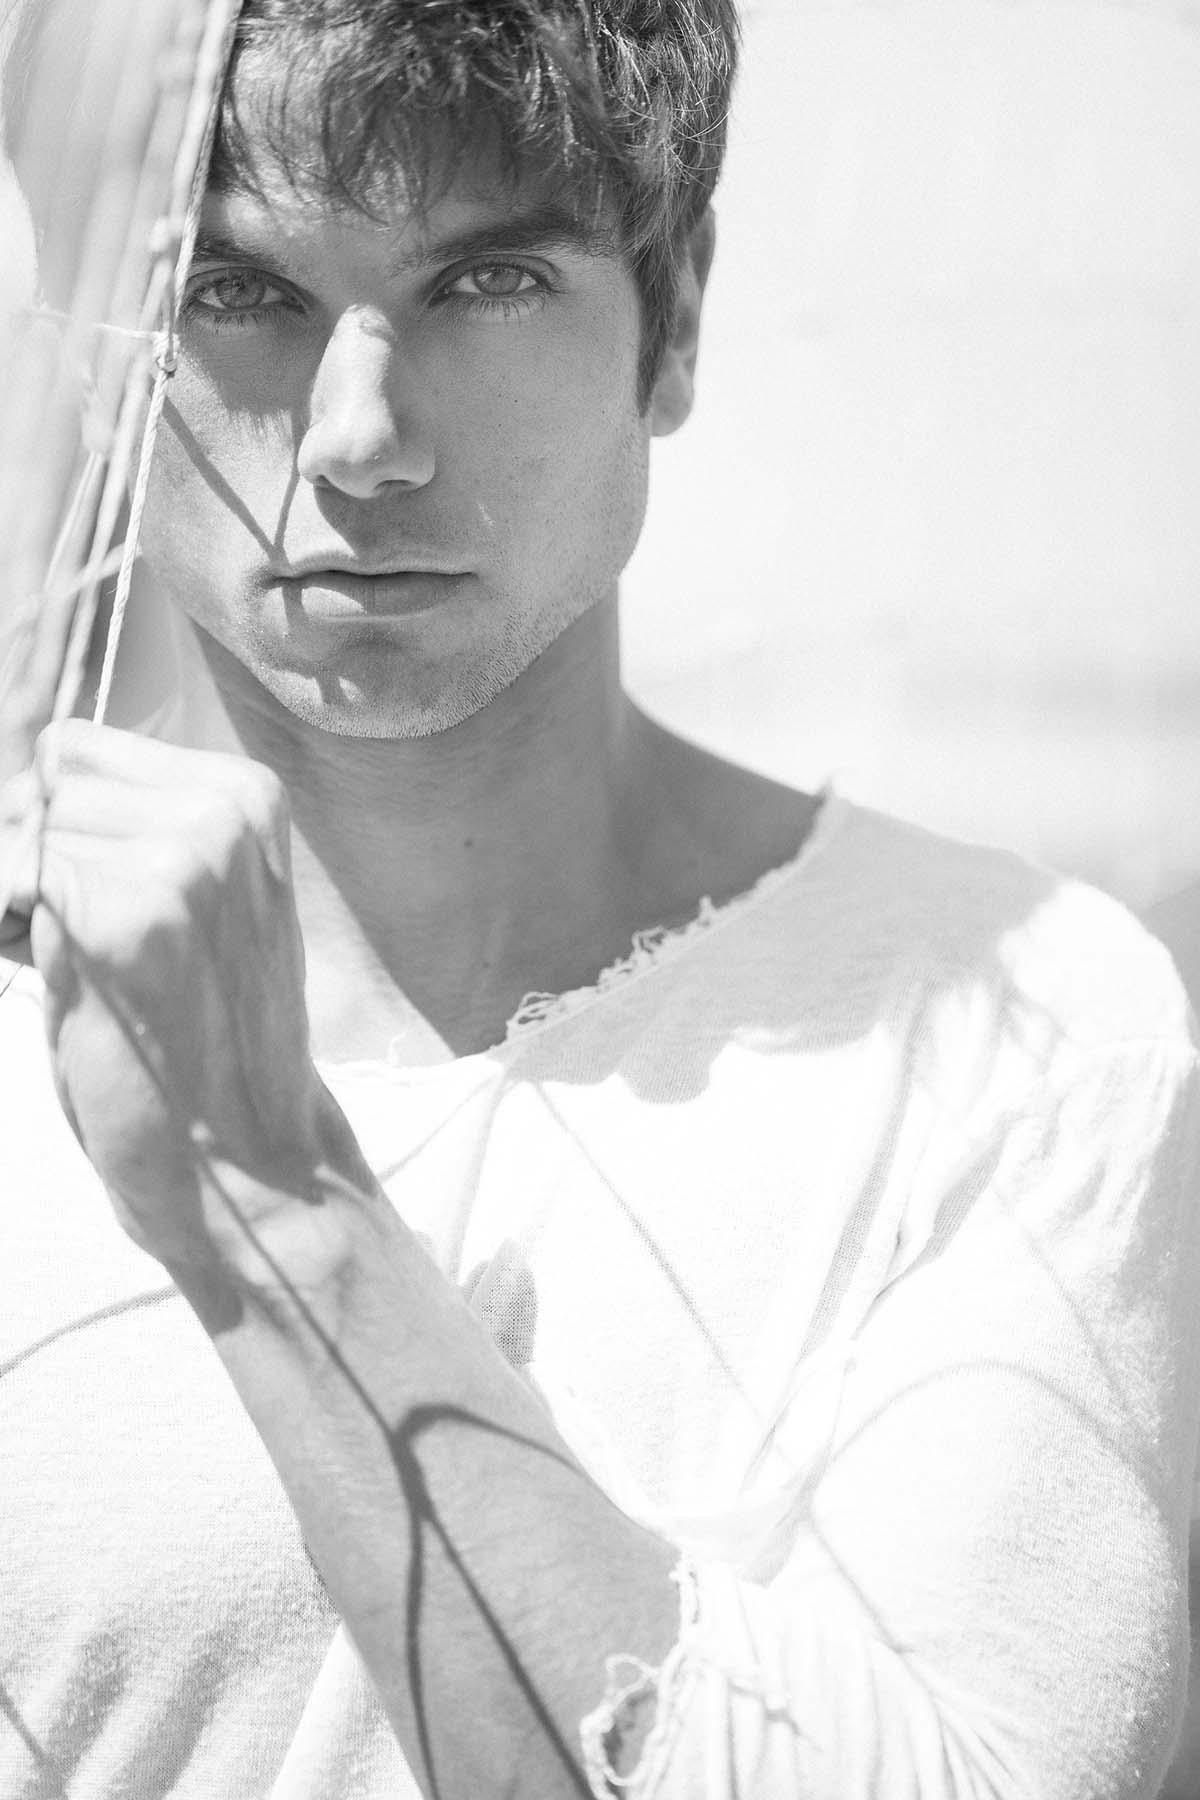 Kaue Machado by Ricardo Lage for Brazilian Male Model